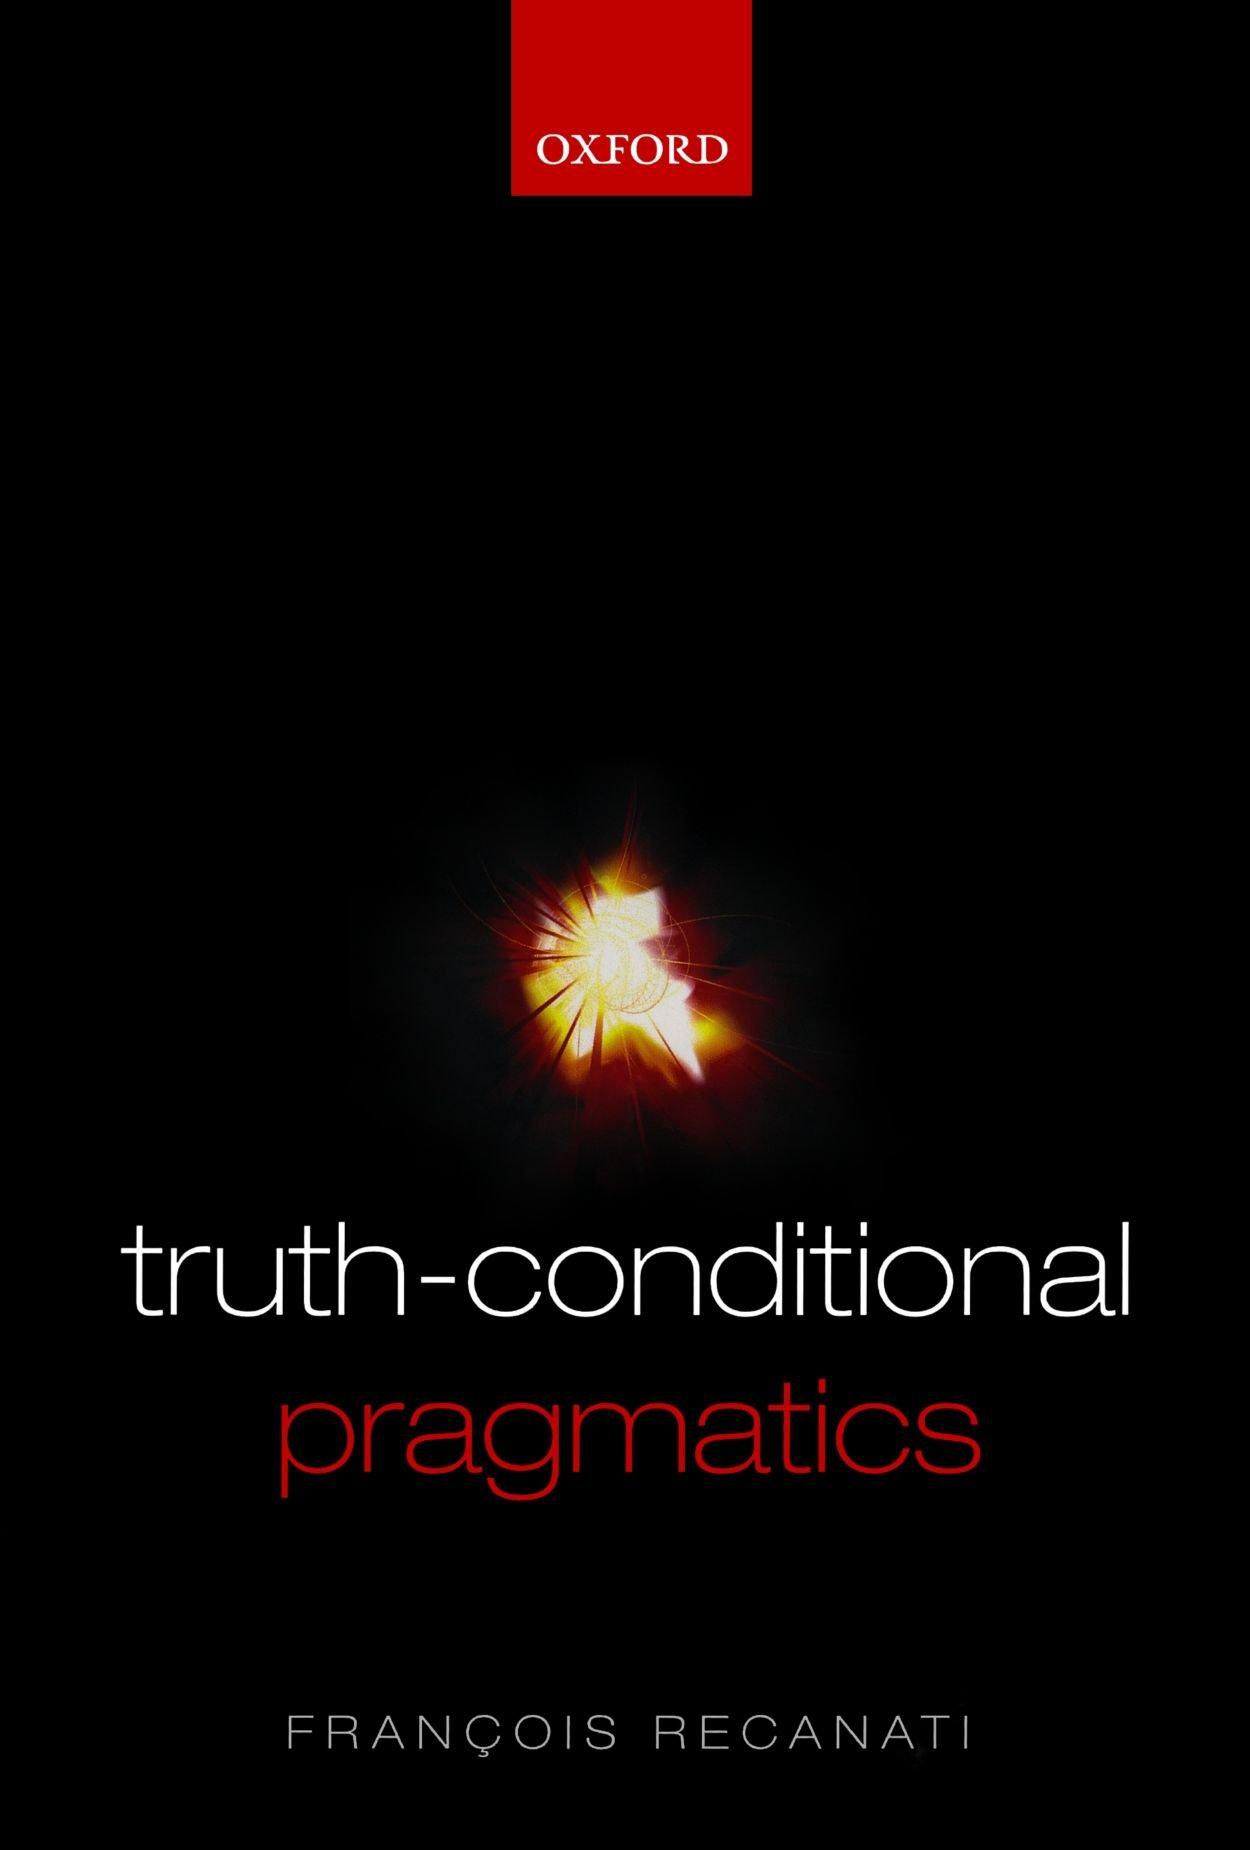 Truth Conditional Pragmatics